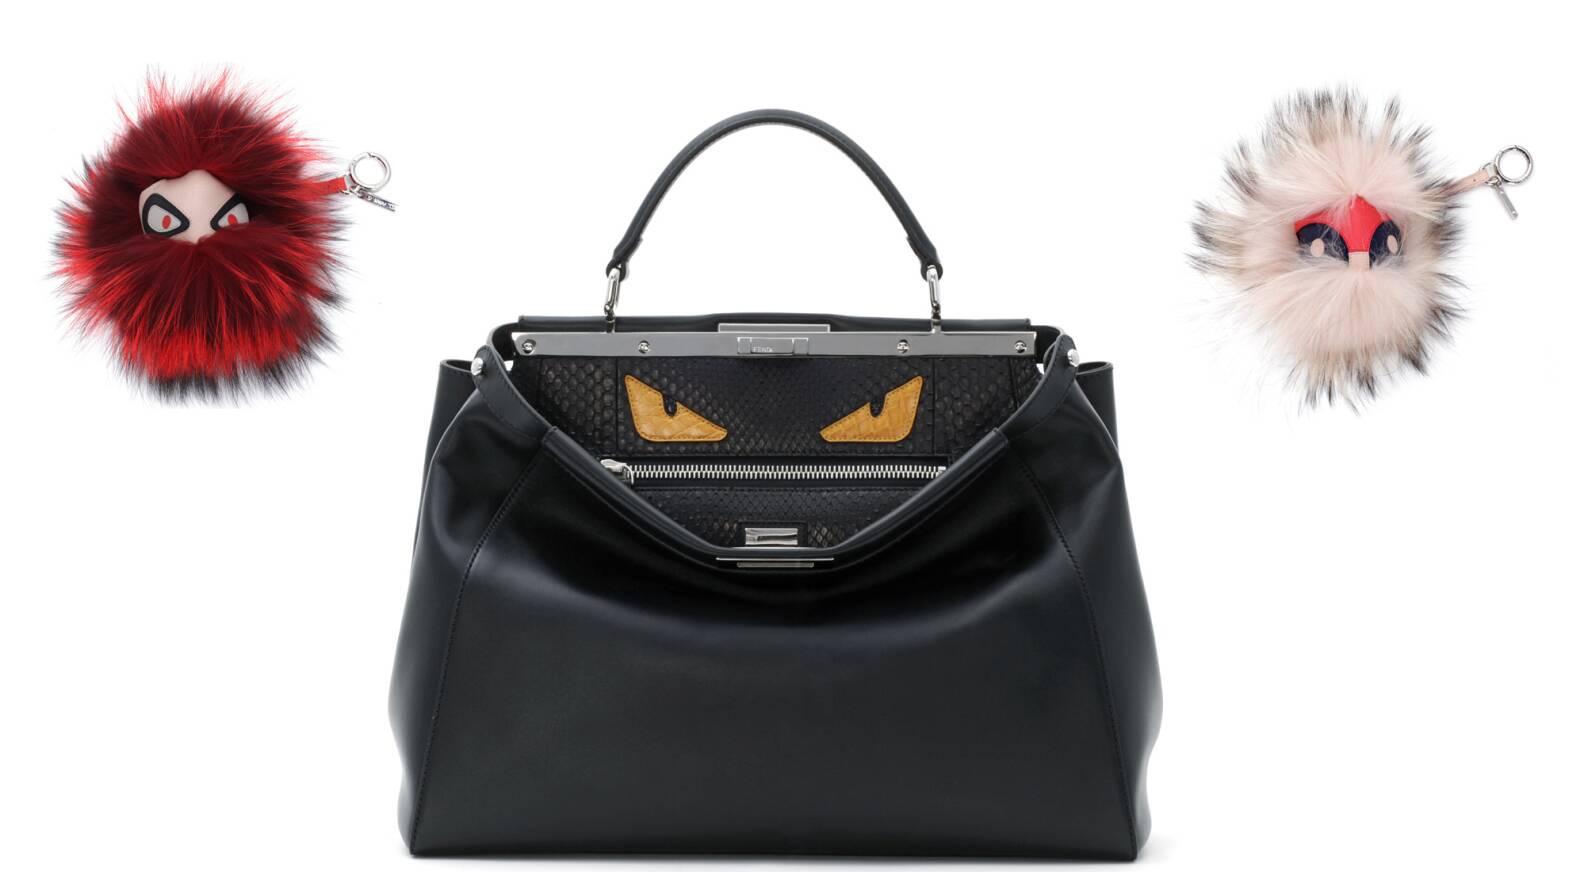 Fendi Announces Bag Bugs Invasion Lvmh